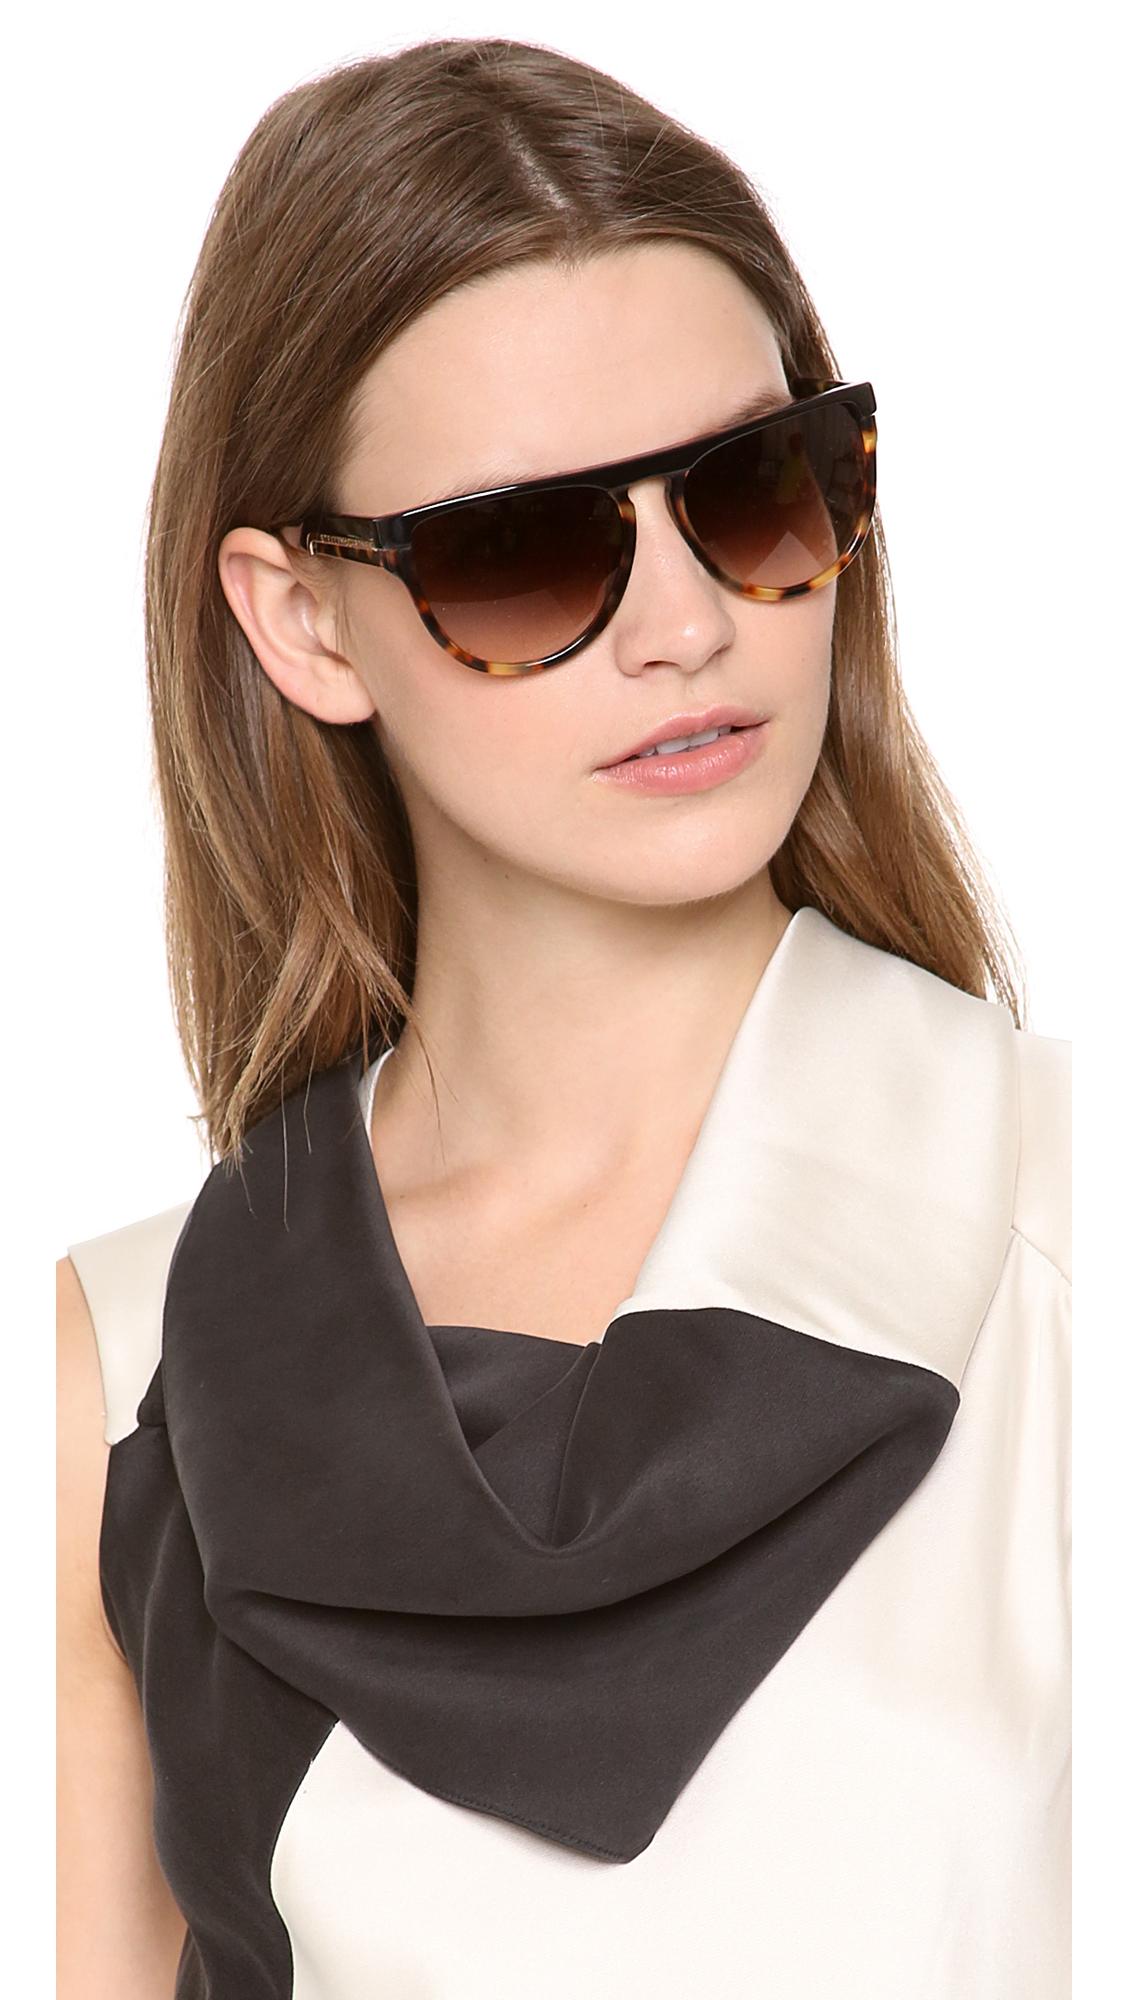 d00e780c776 ray Ban Boyfriend 60mm Flat Top Sunglasses